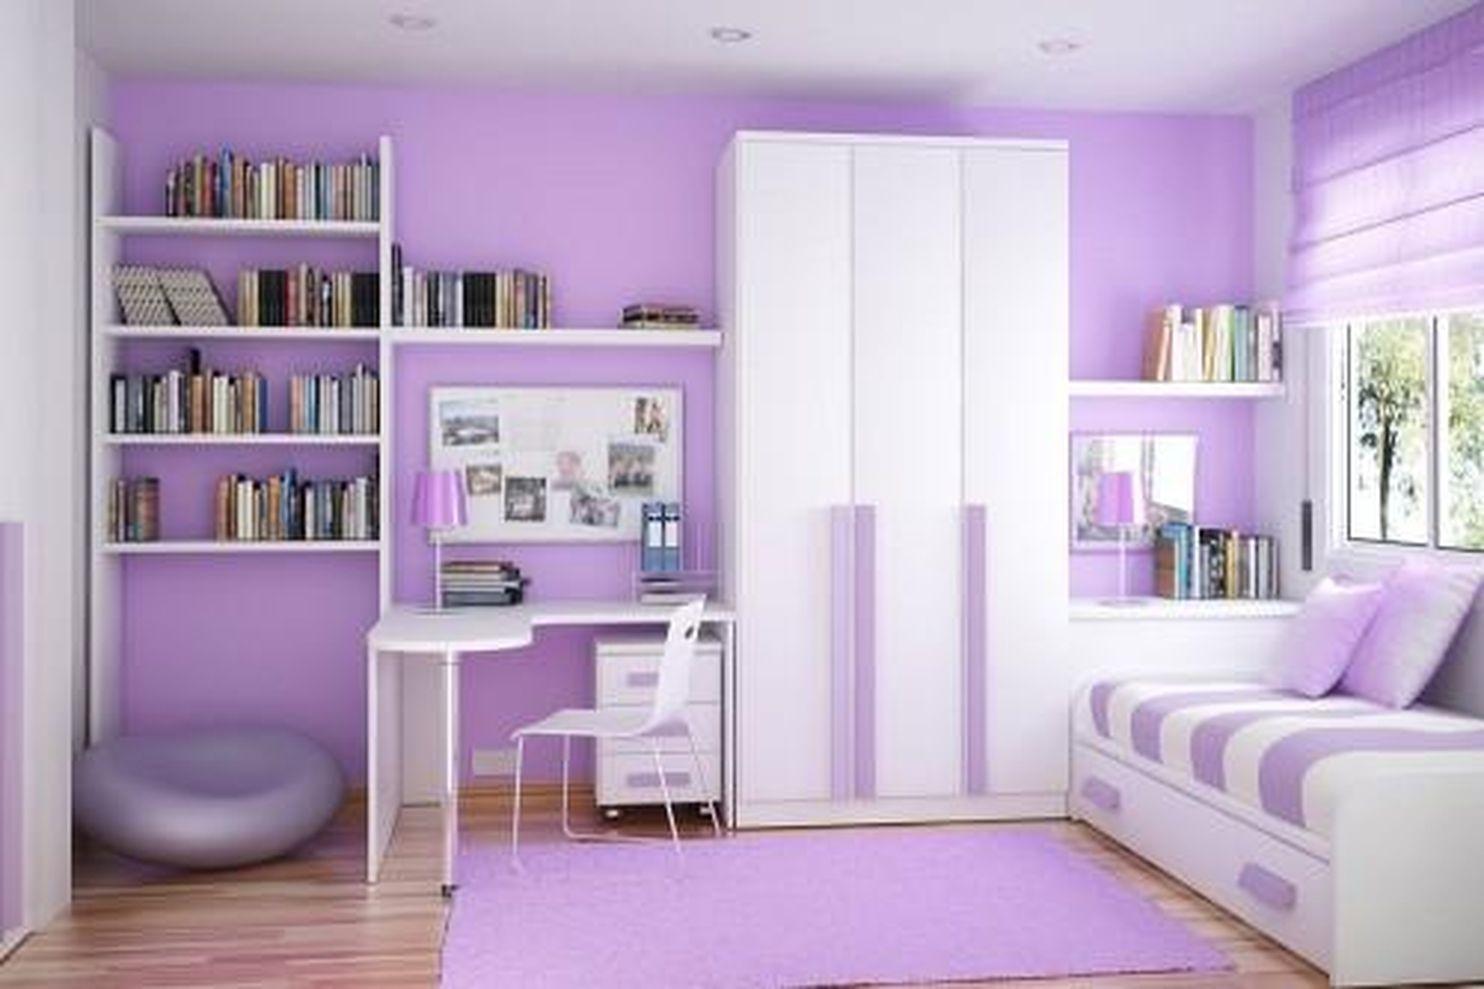 96 Inspiring Bedroom Design Ideas For Teenage Girl Roundecor Purple Room Decor Girl Bedroom Decor Bedroom Design Teen bedroom design purple